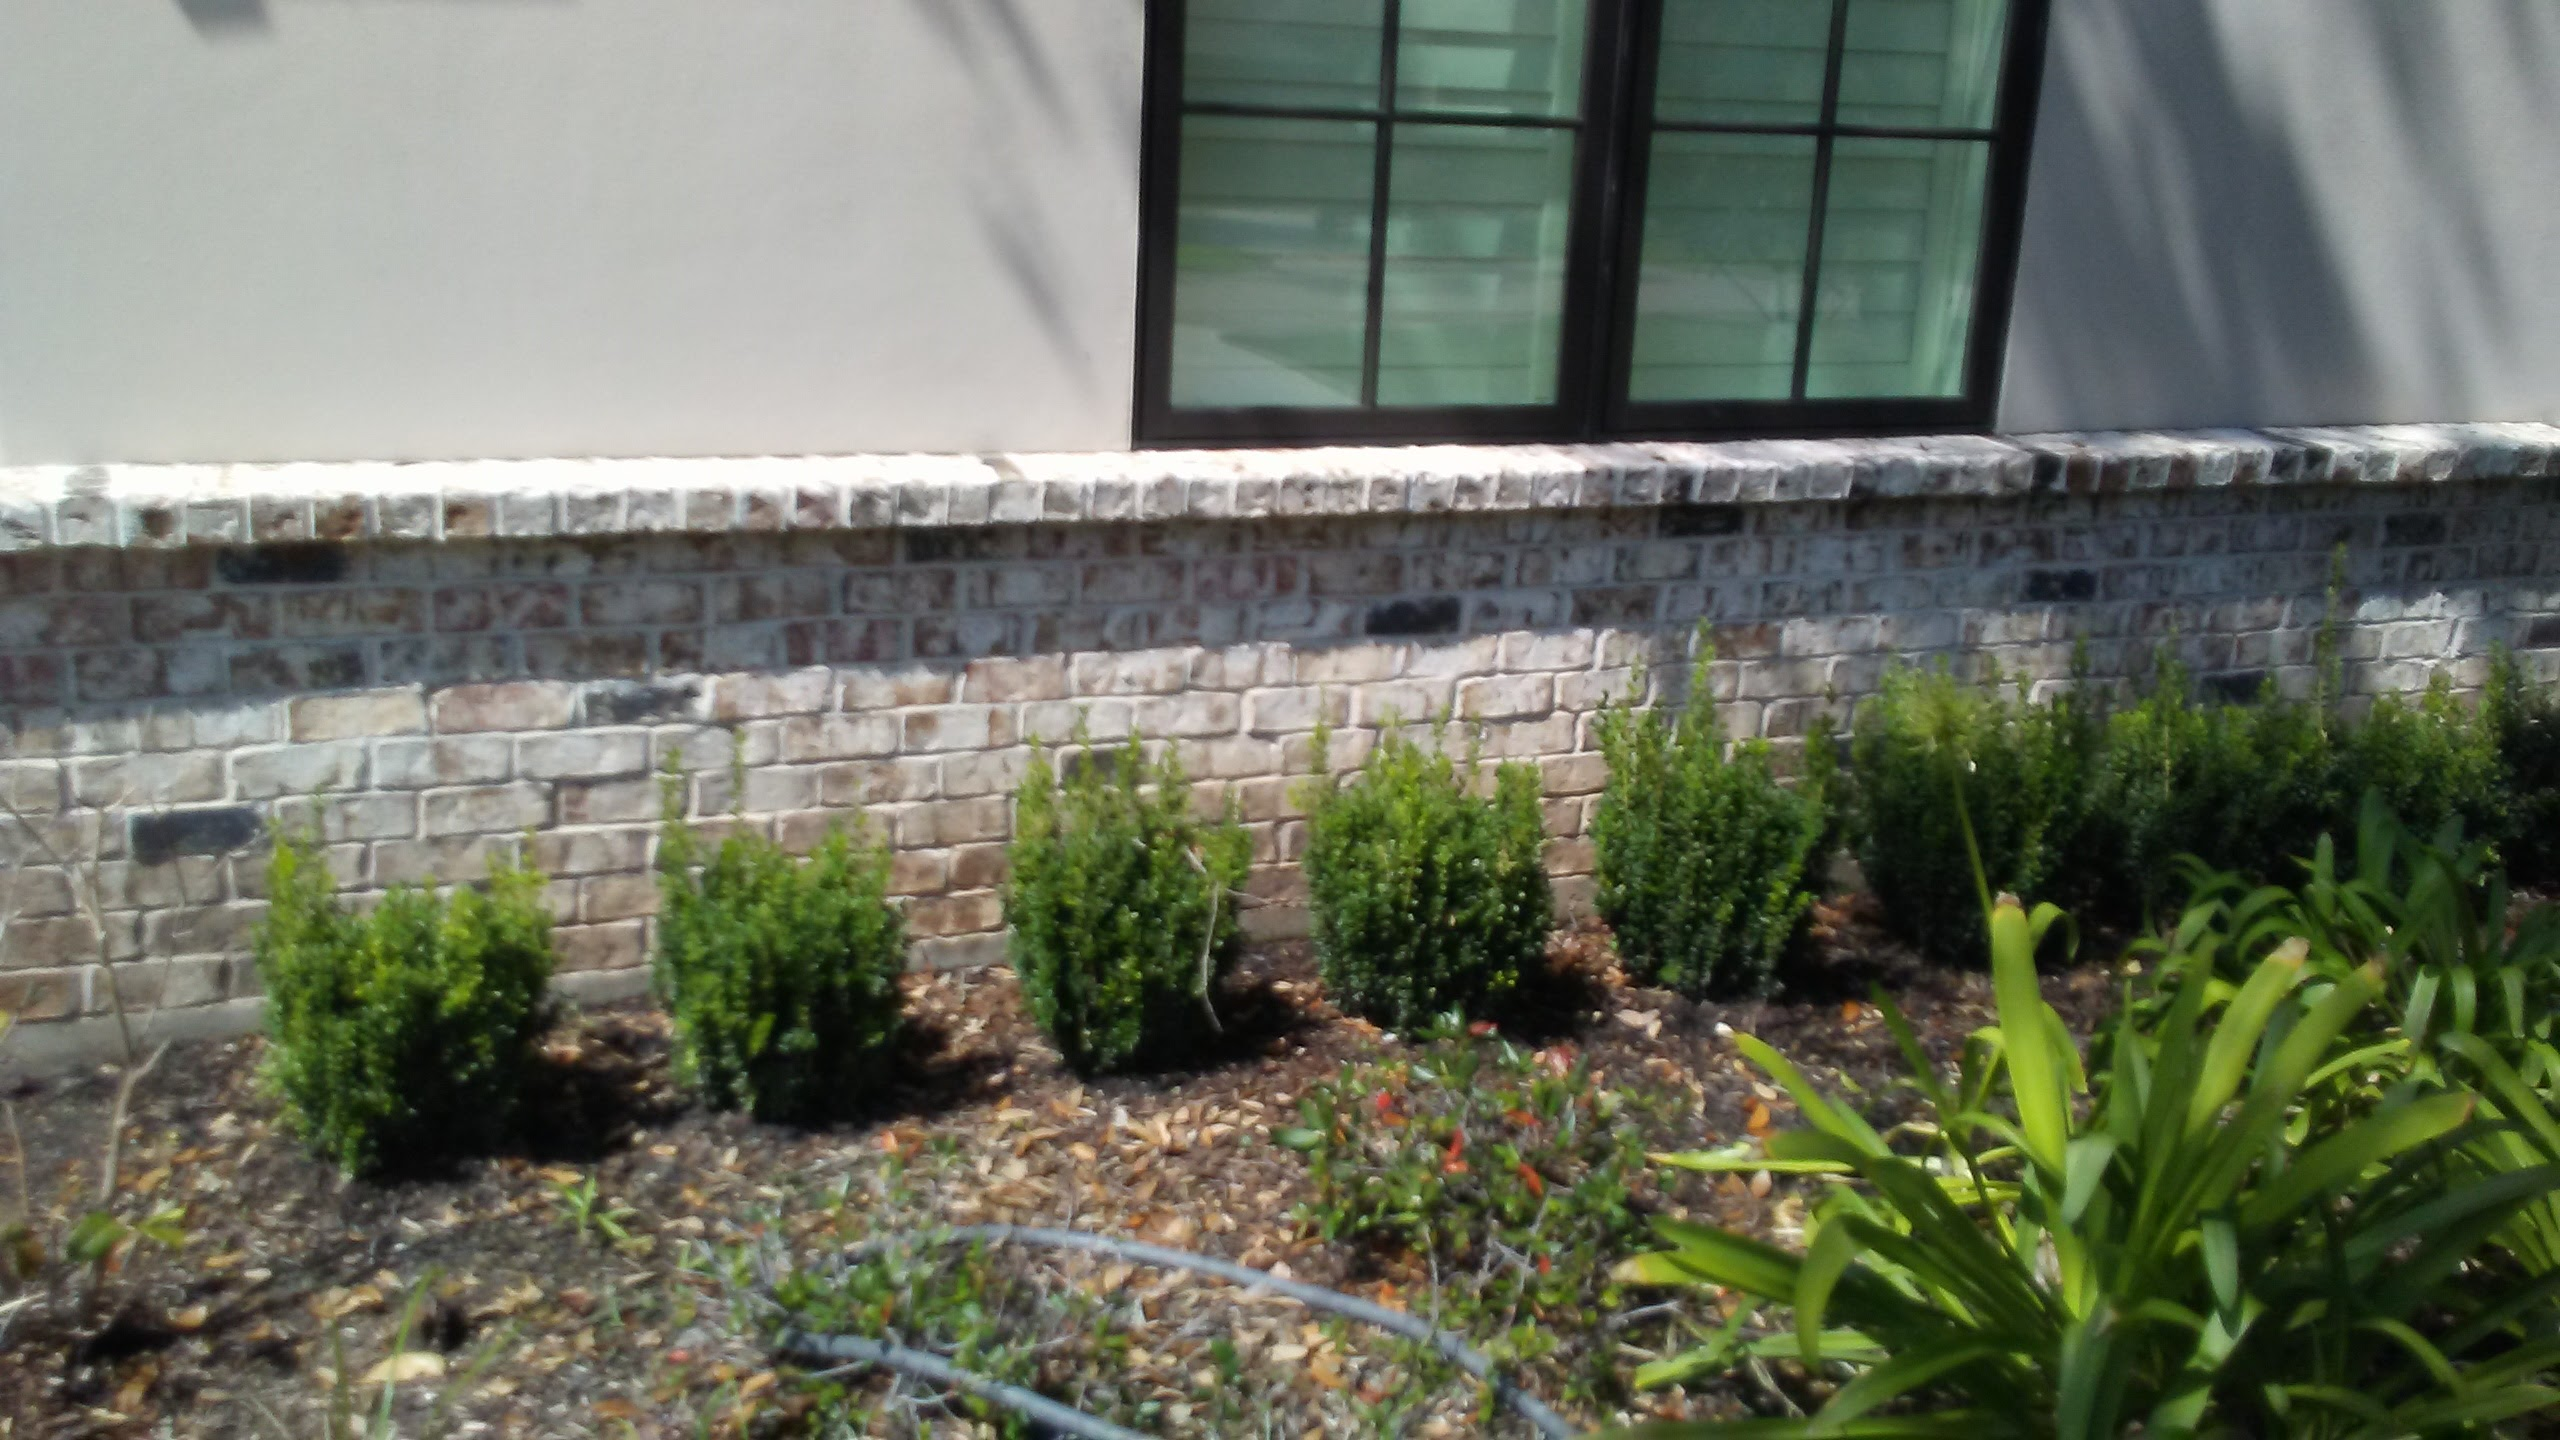 Brick half-wall